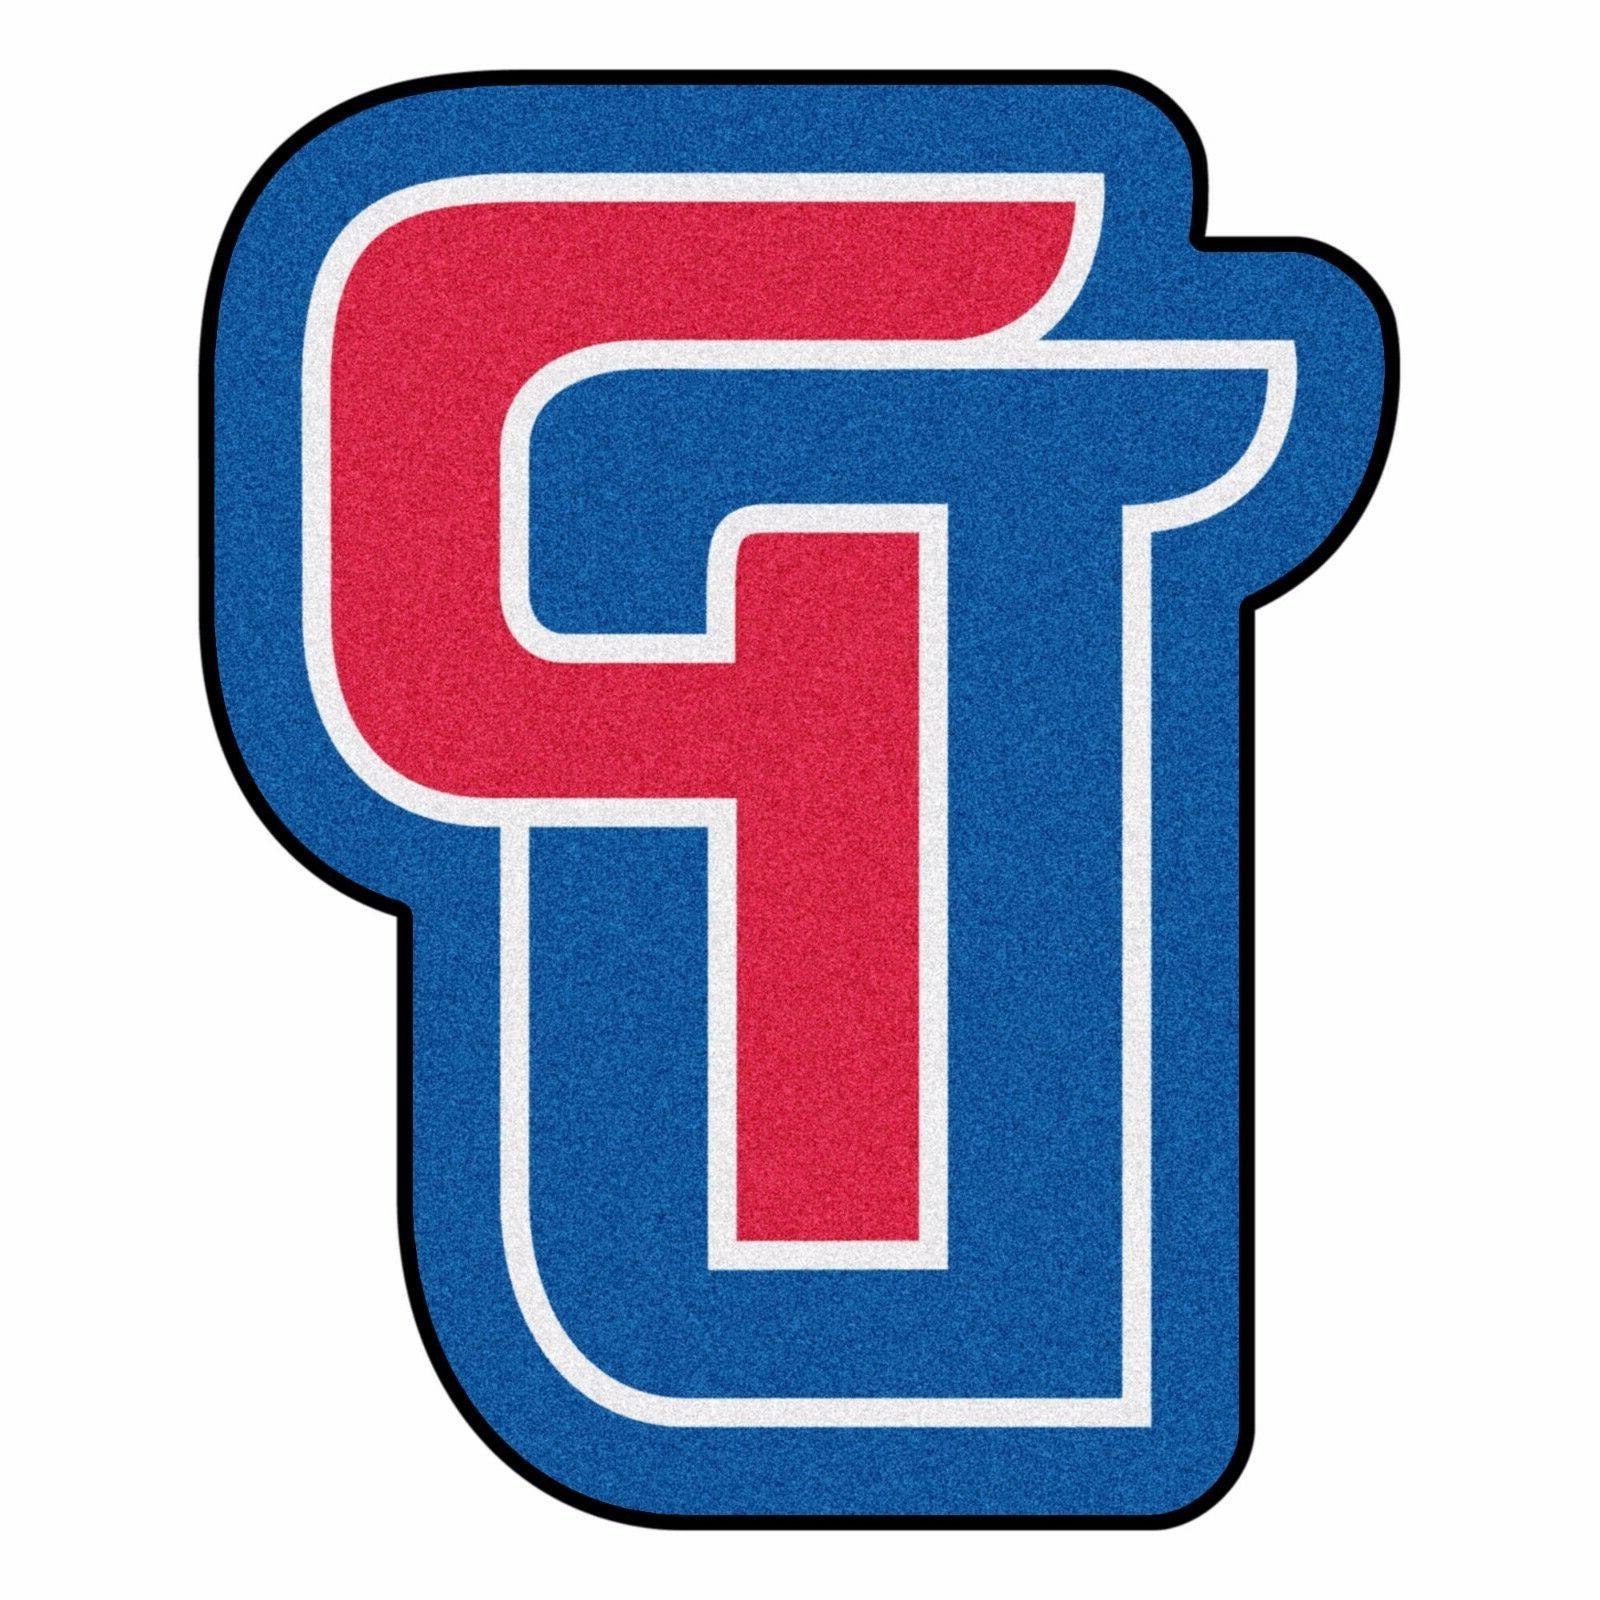 detroit pistons mascot decorative logo cut area